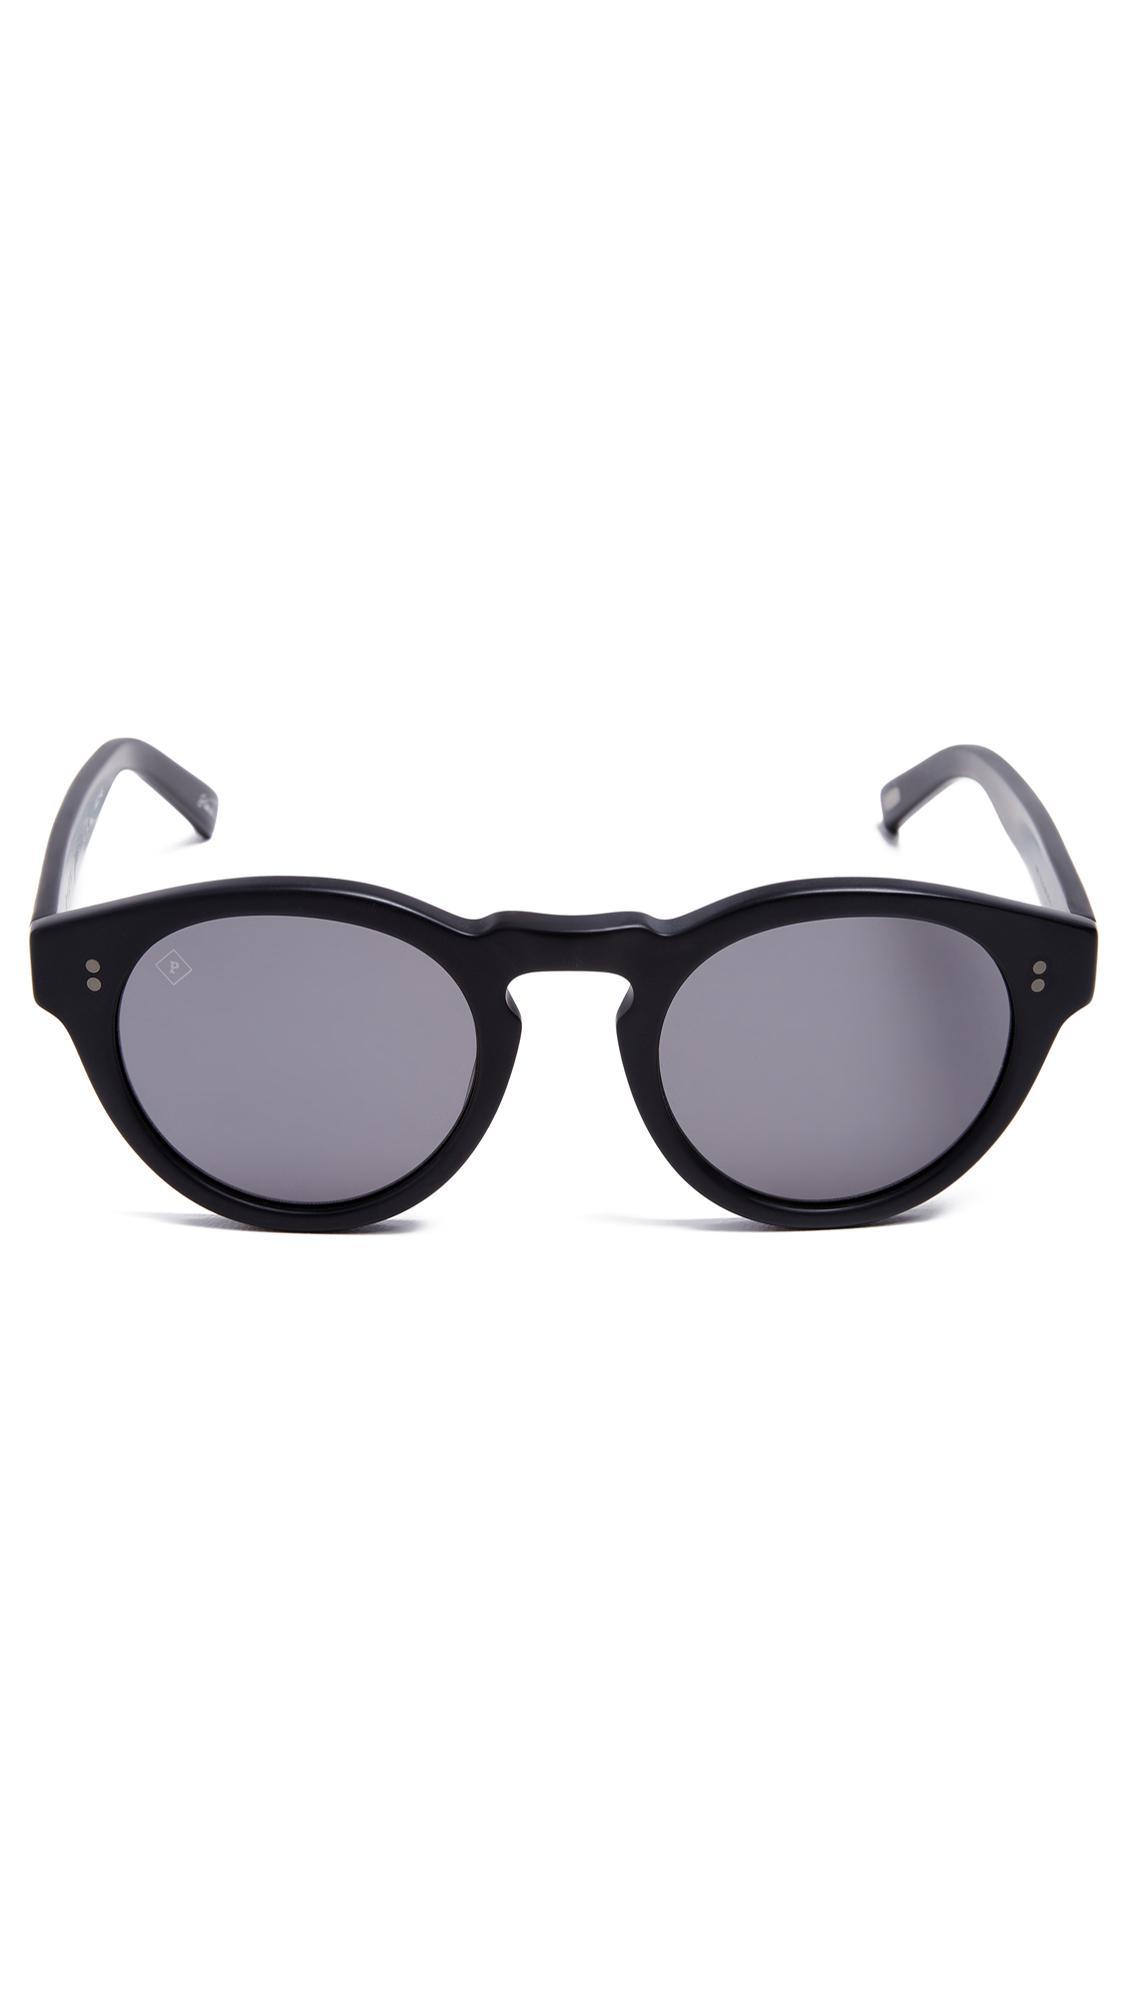 fcdcc69079a1 Raen Parkhurst Polarized Sunglasses in Black for Men - Lyst